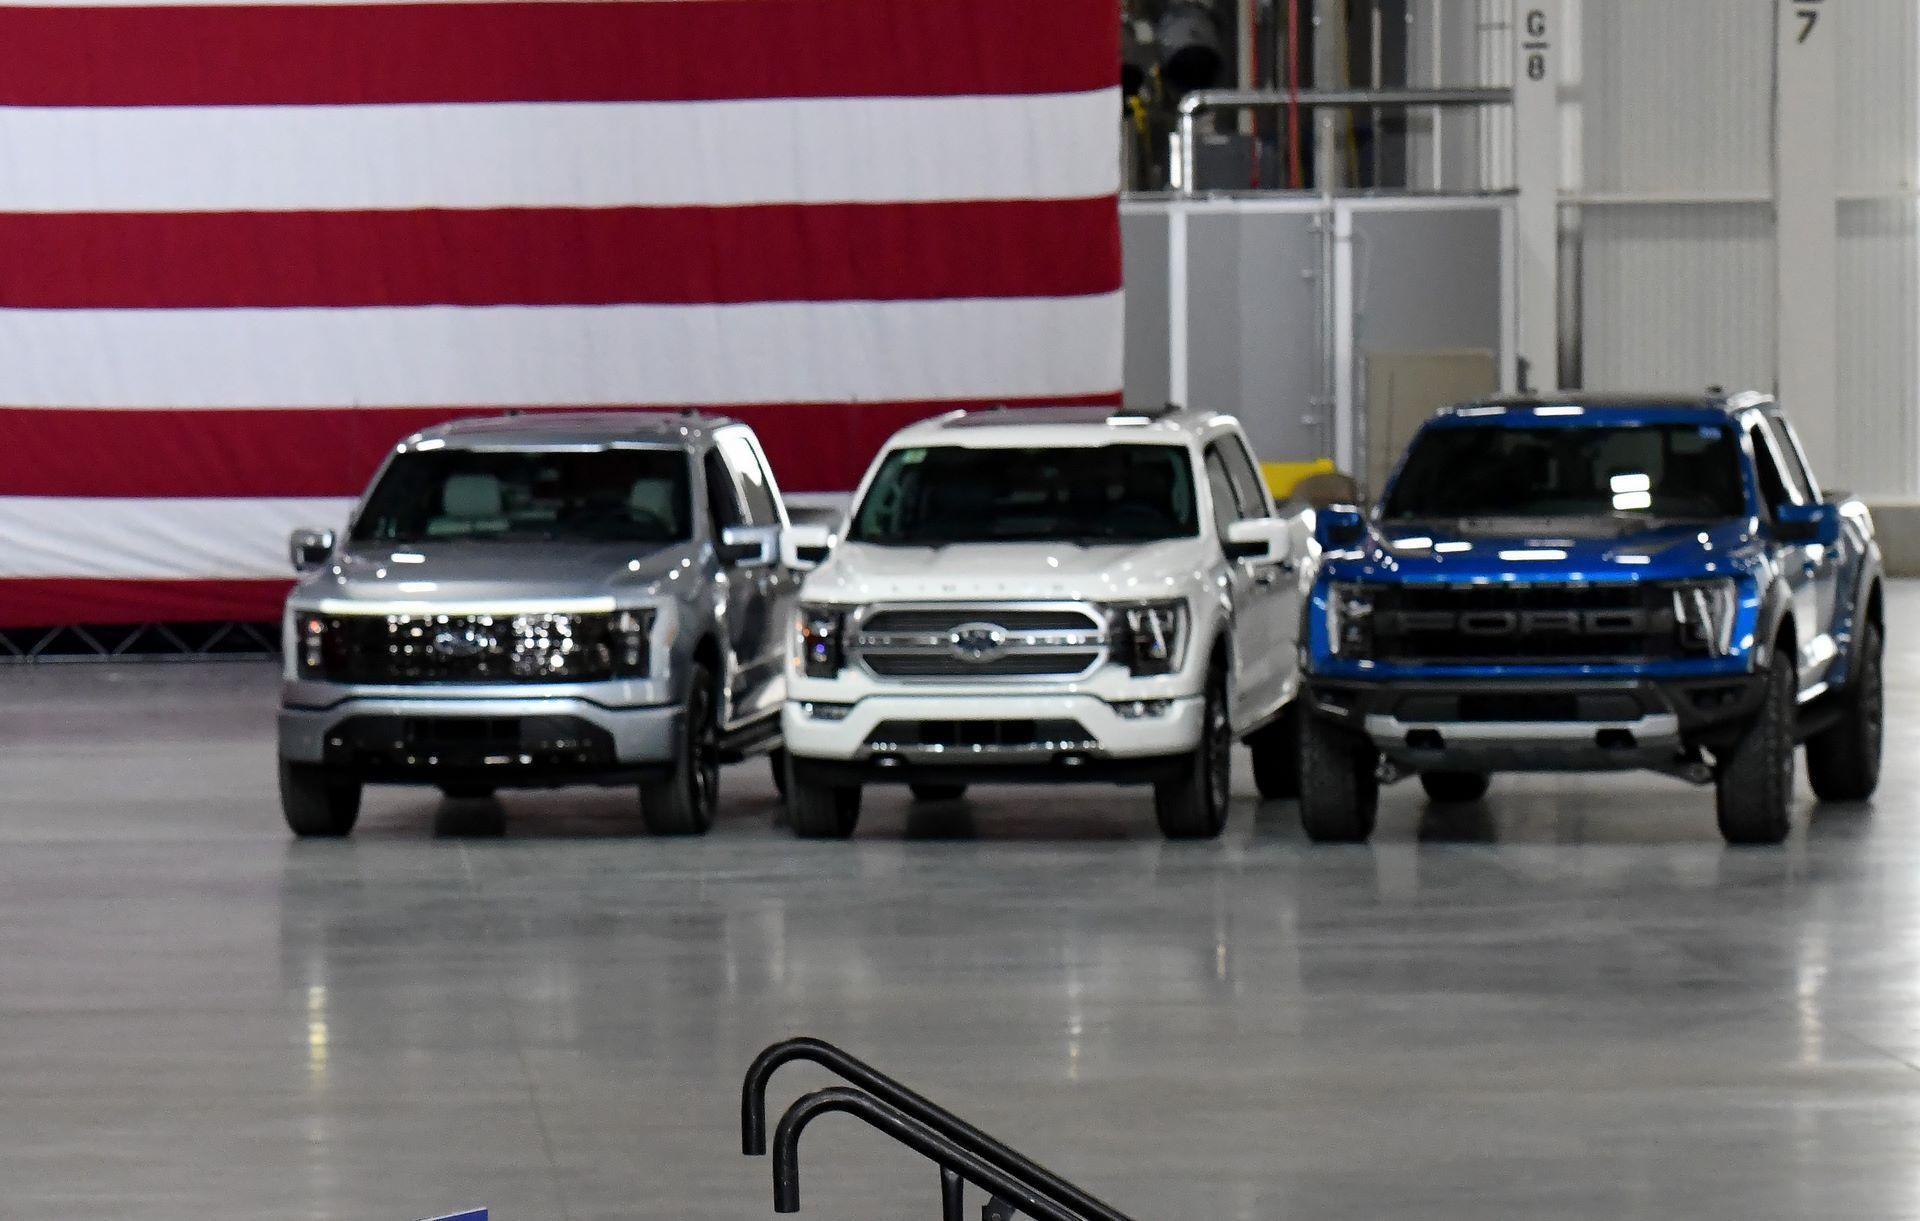 President Biden Visits Rouge Electric Vehicle Center